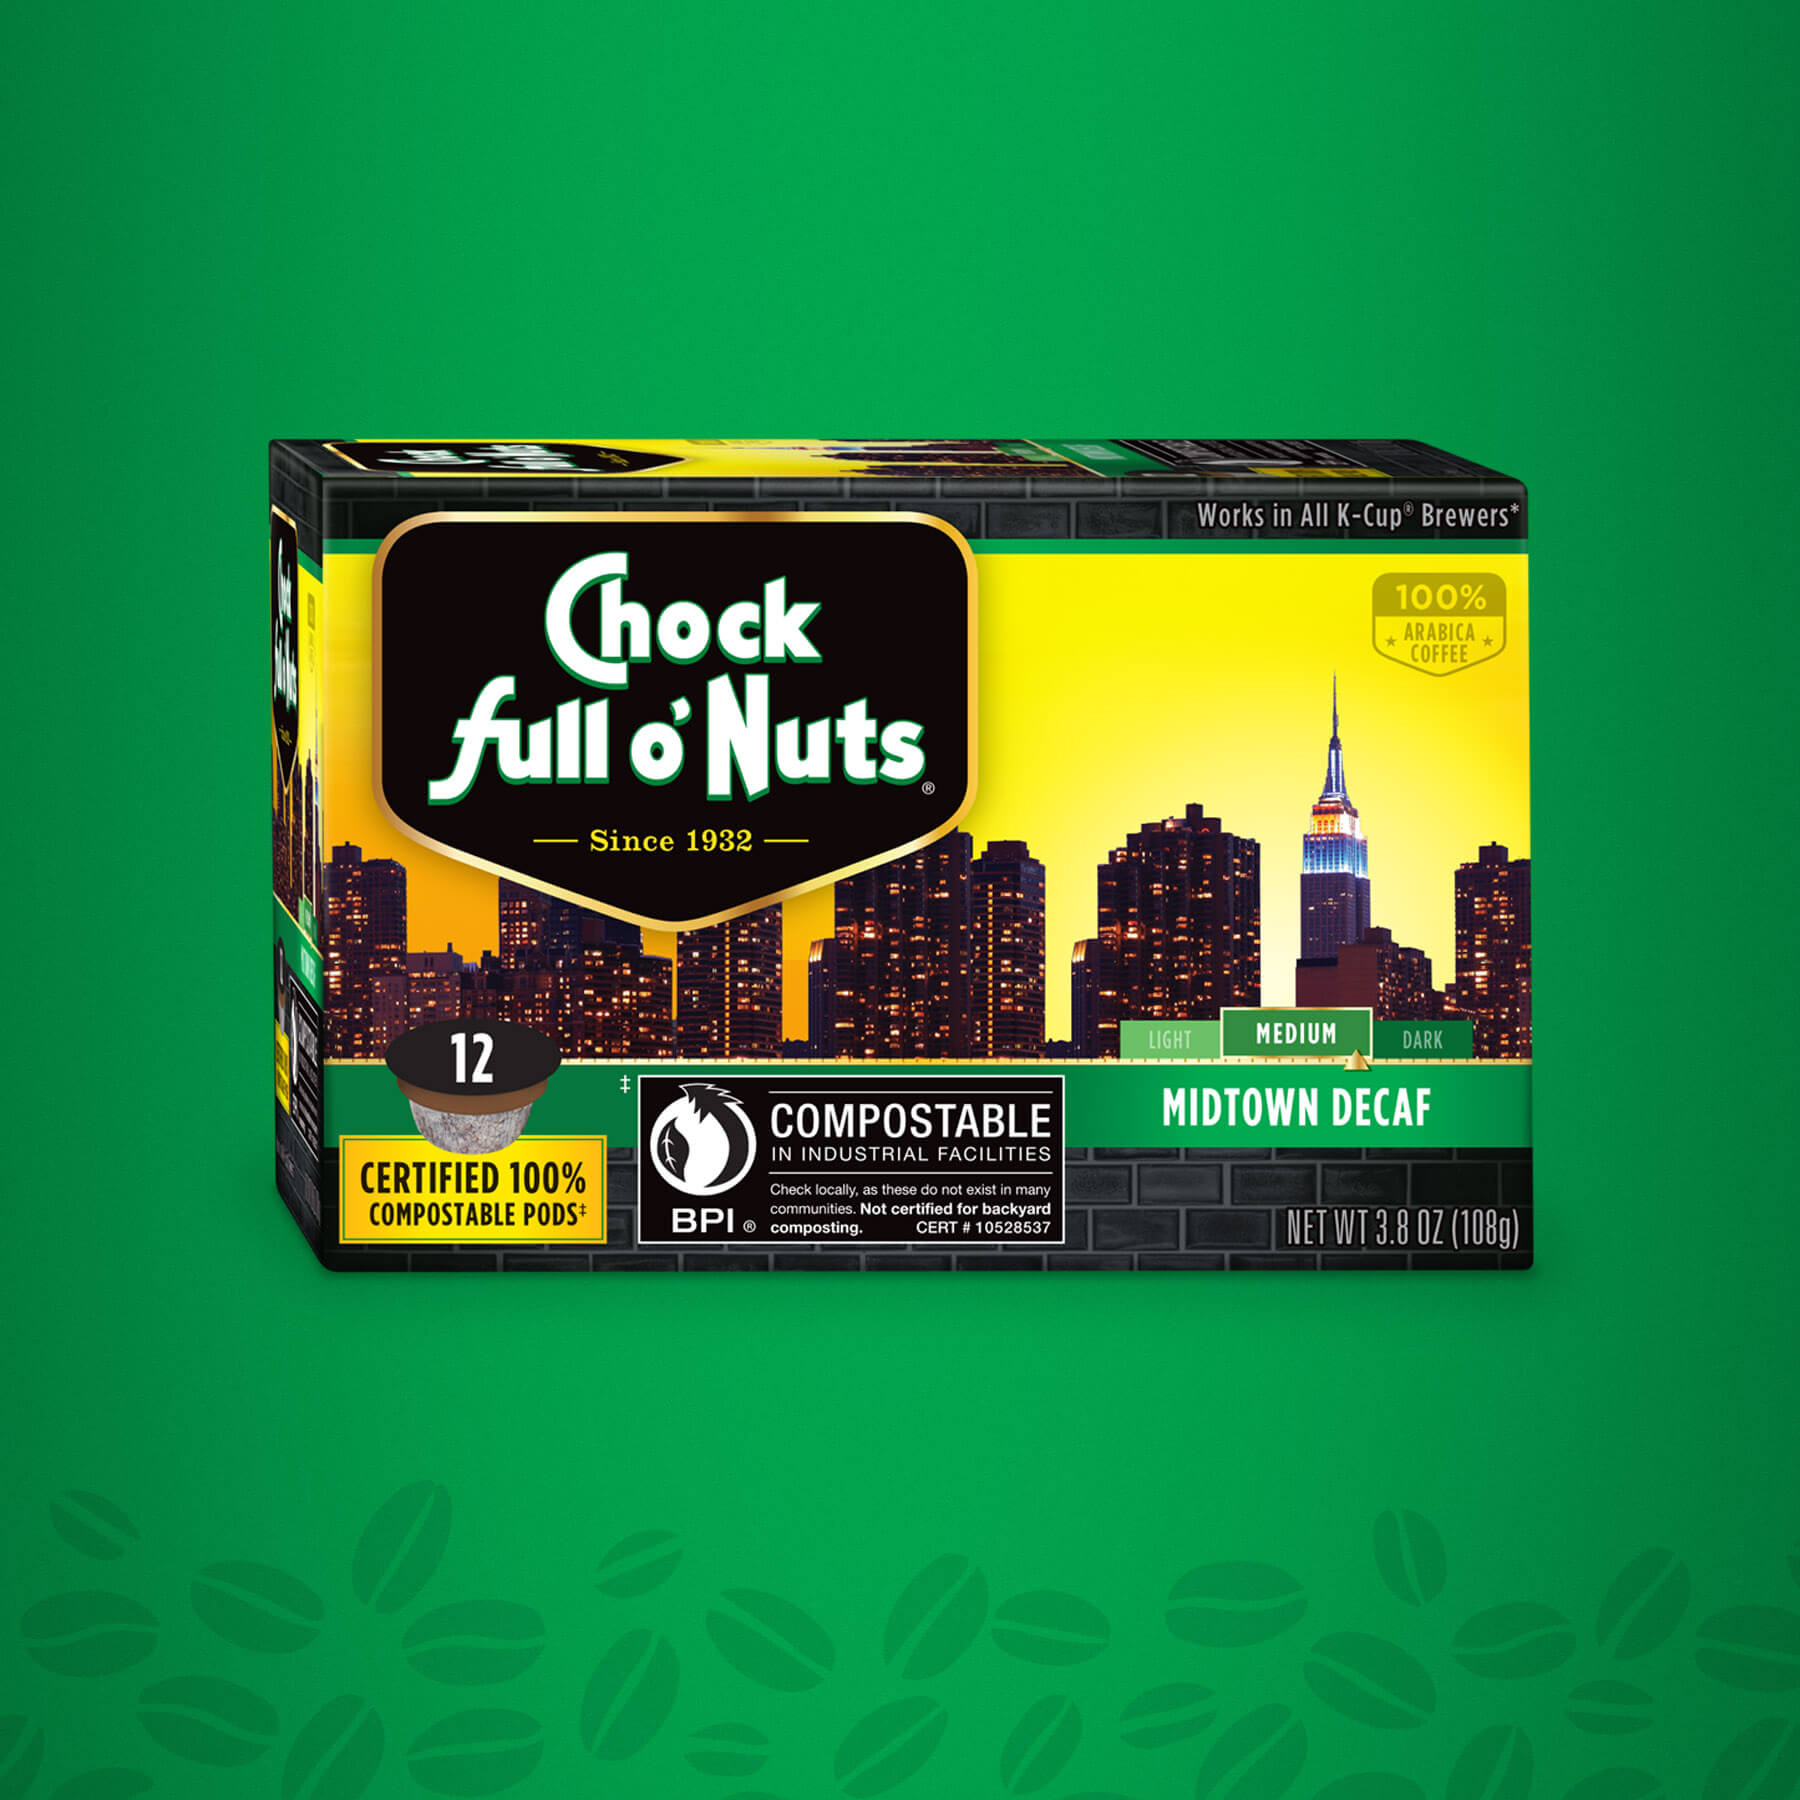 Chock full o' Nuts Midtown Decaf Package Design